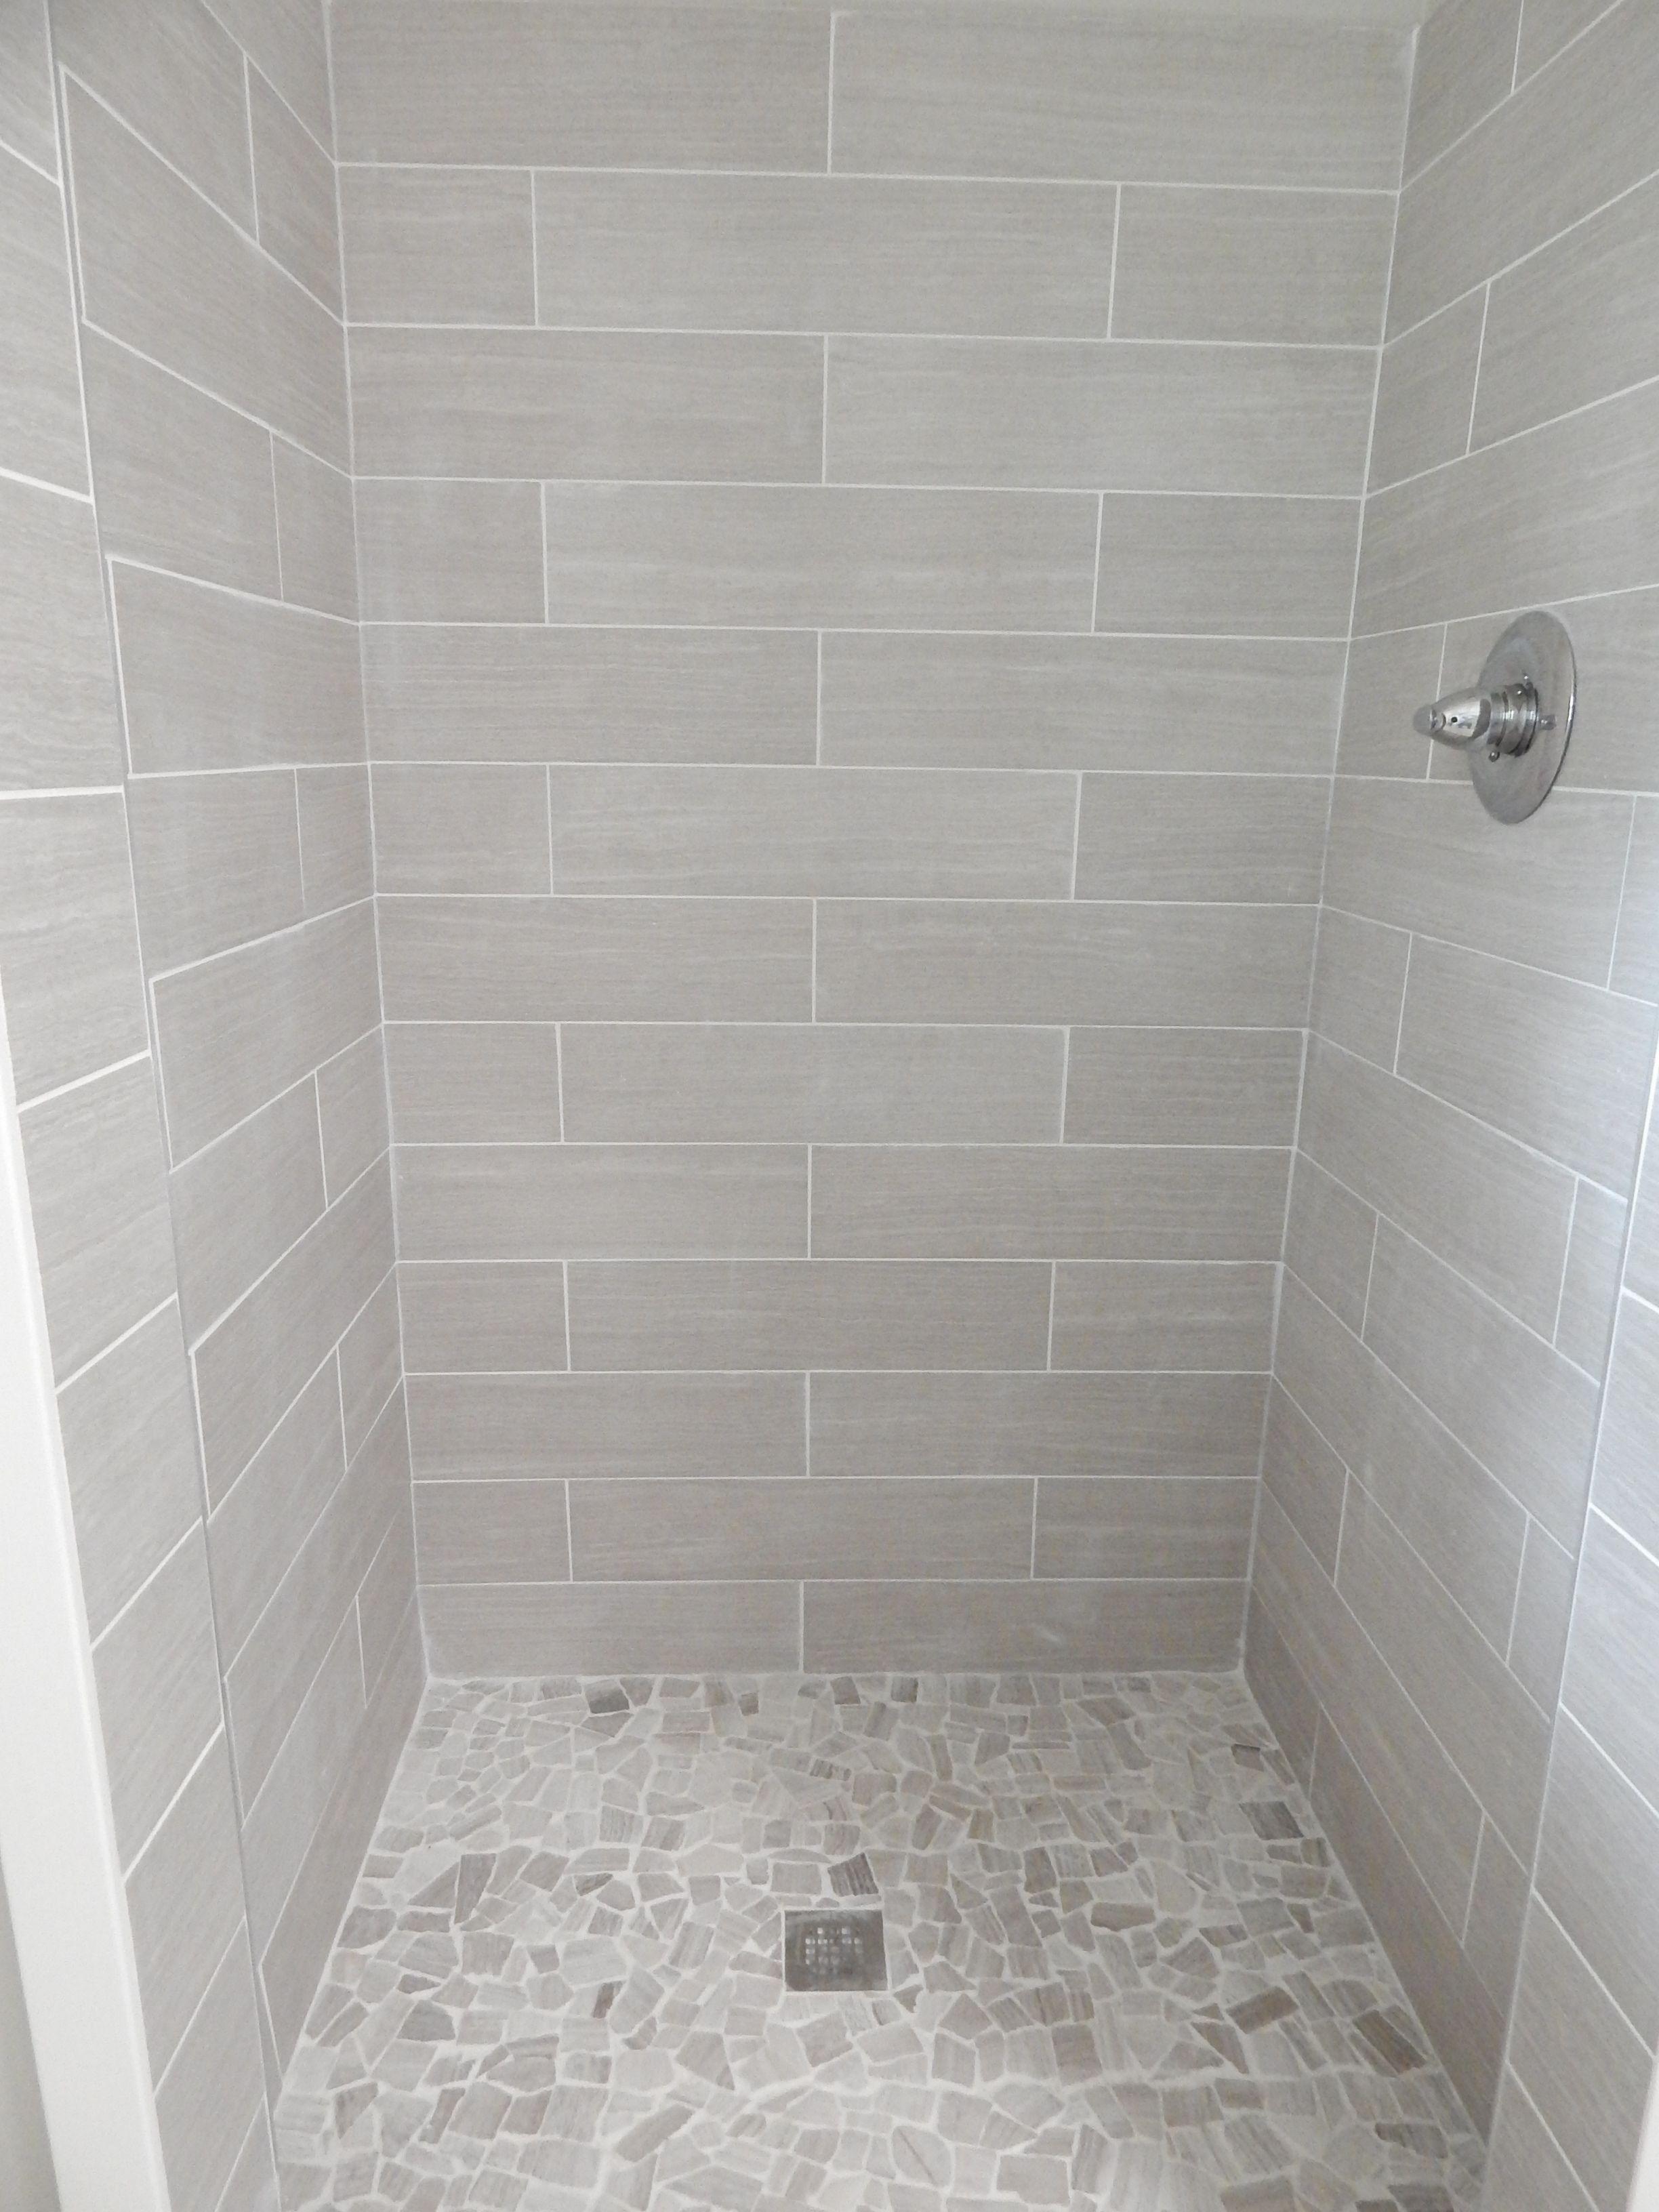 Pin By Viv T On Flooring Tiles In 2020 Bathroom Remodel Small Diy Bathroom Shower Tile Restroom Tile